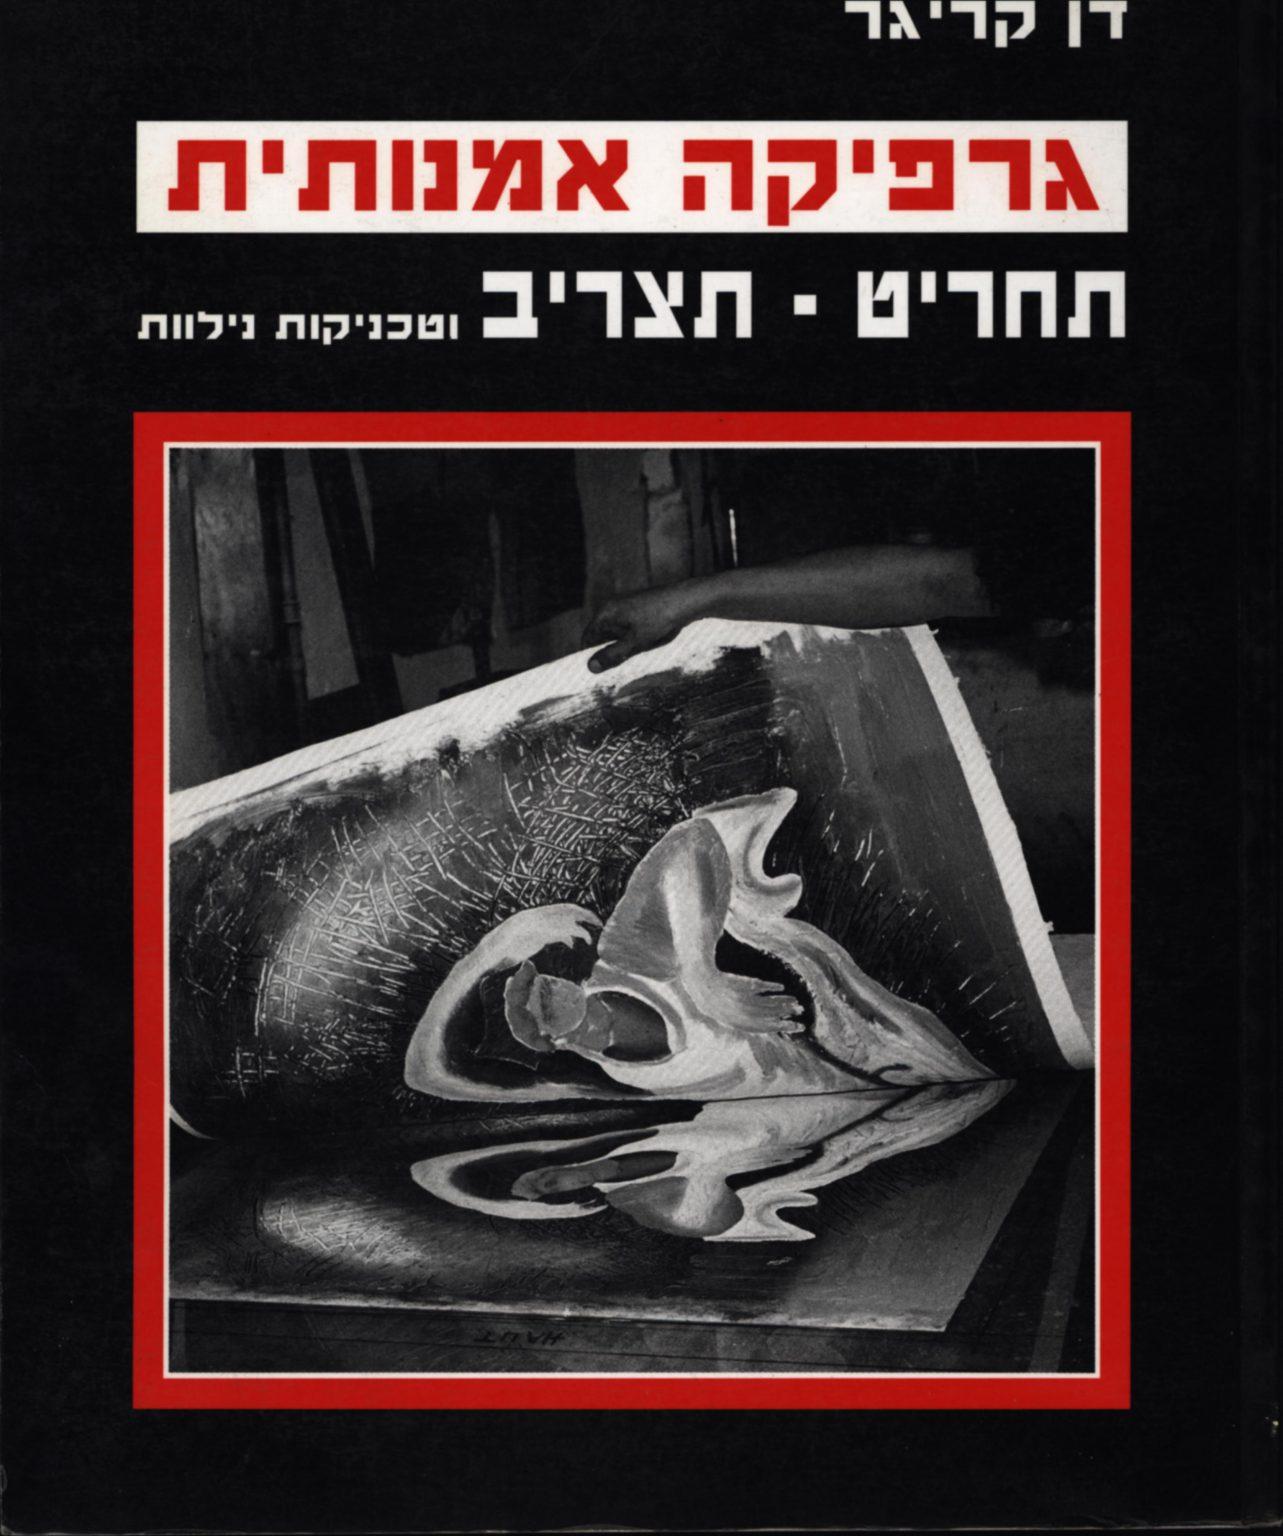 Dan Krger, Fine Art Printmaking, Yediot Ahronot, Tel Aviv, 1995 (heb.)